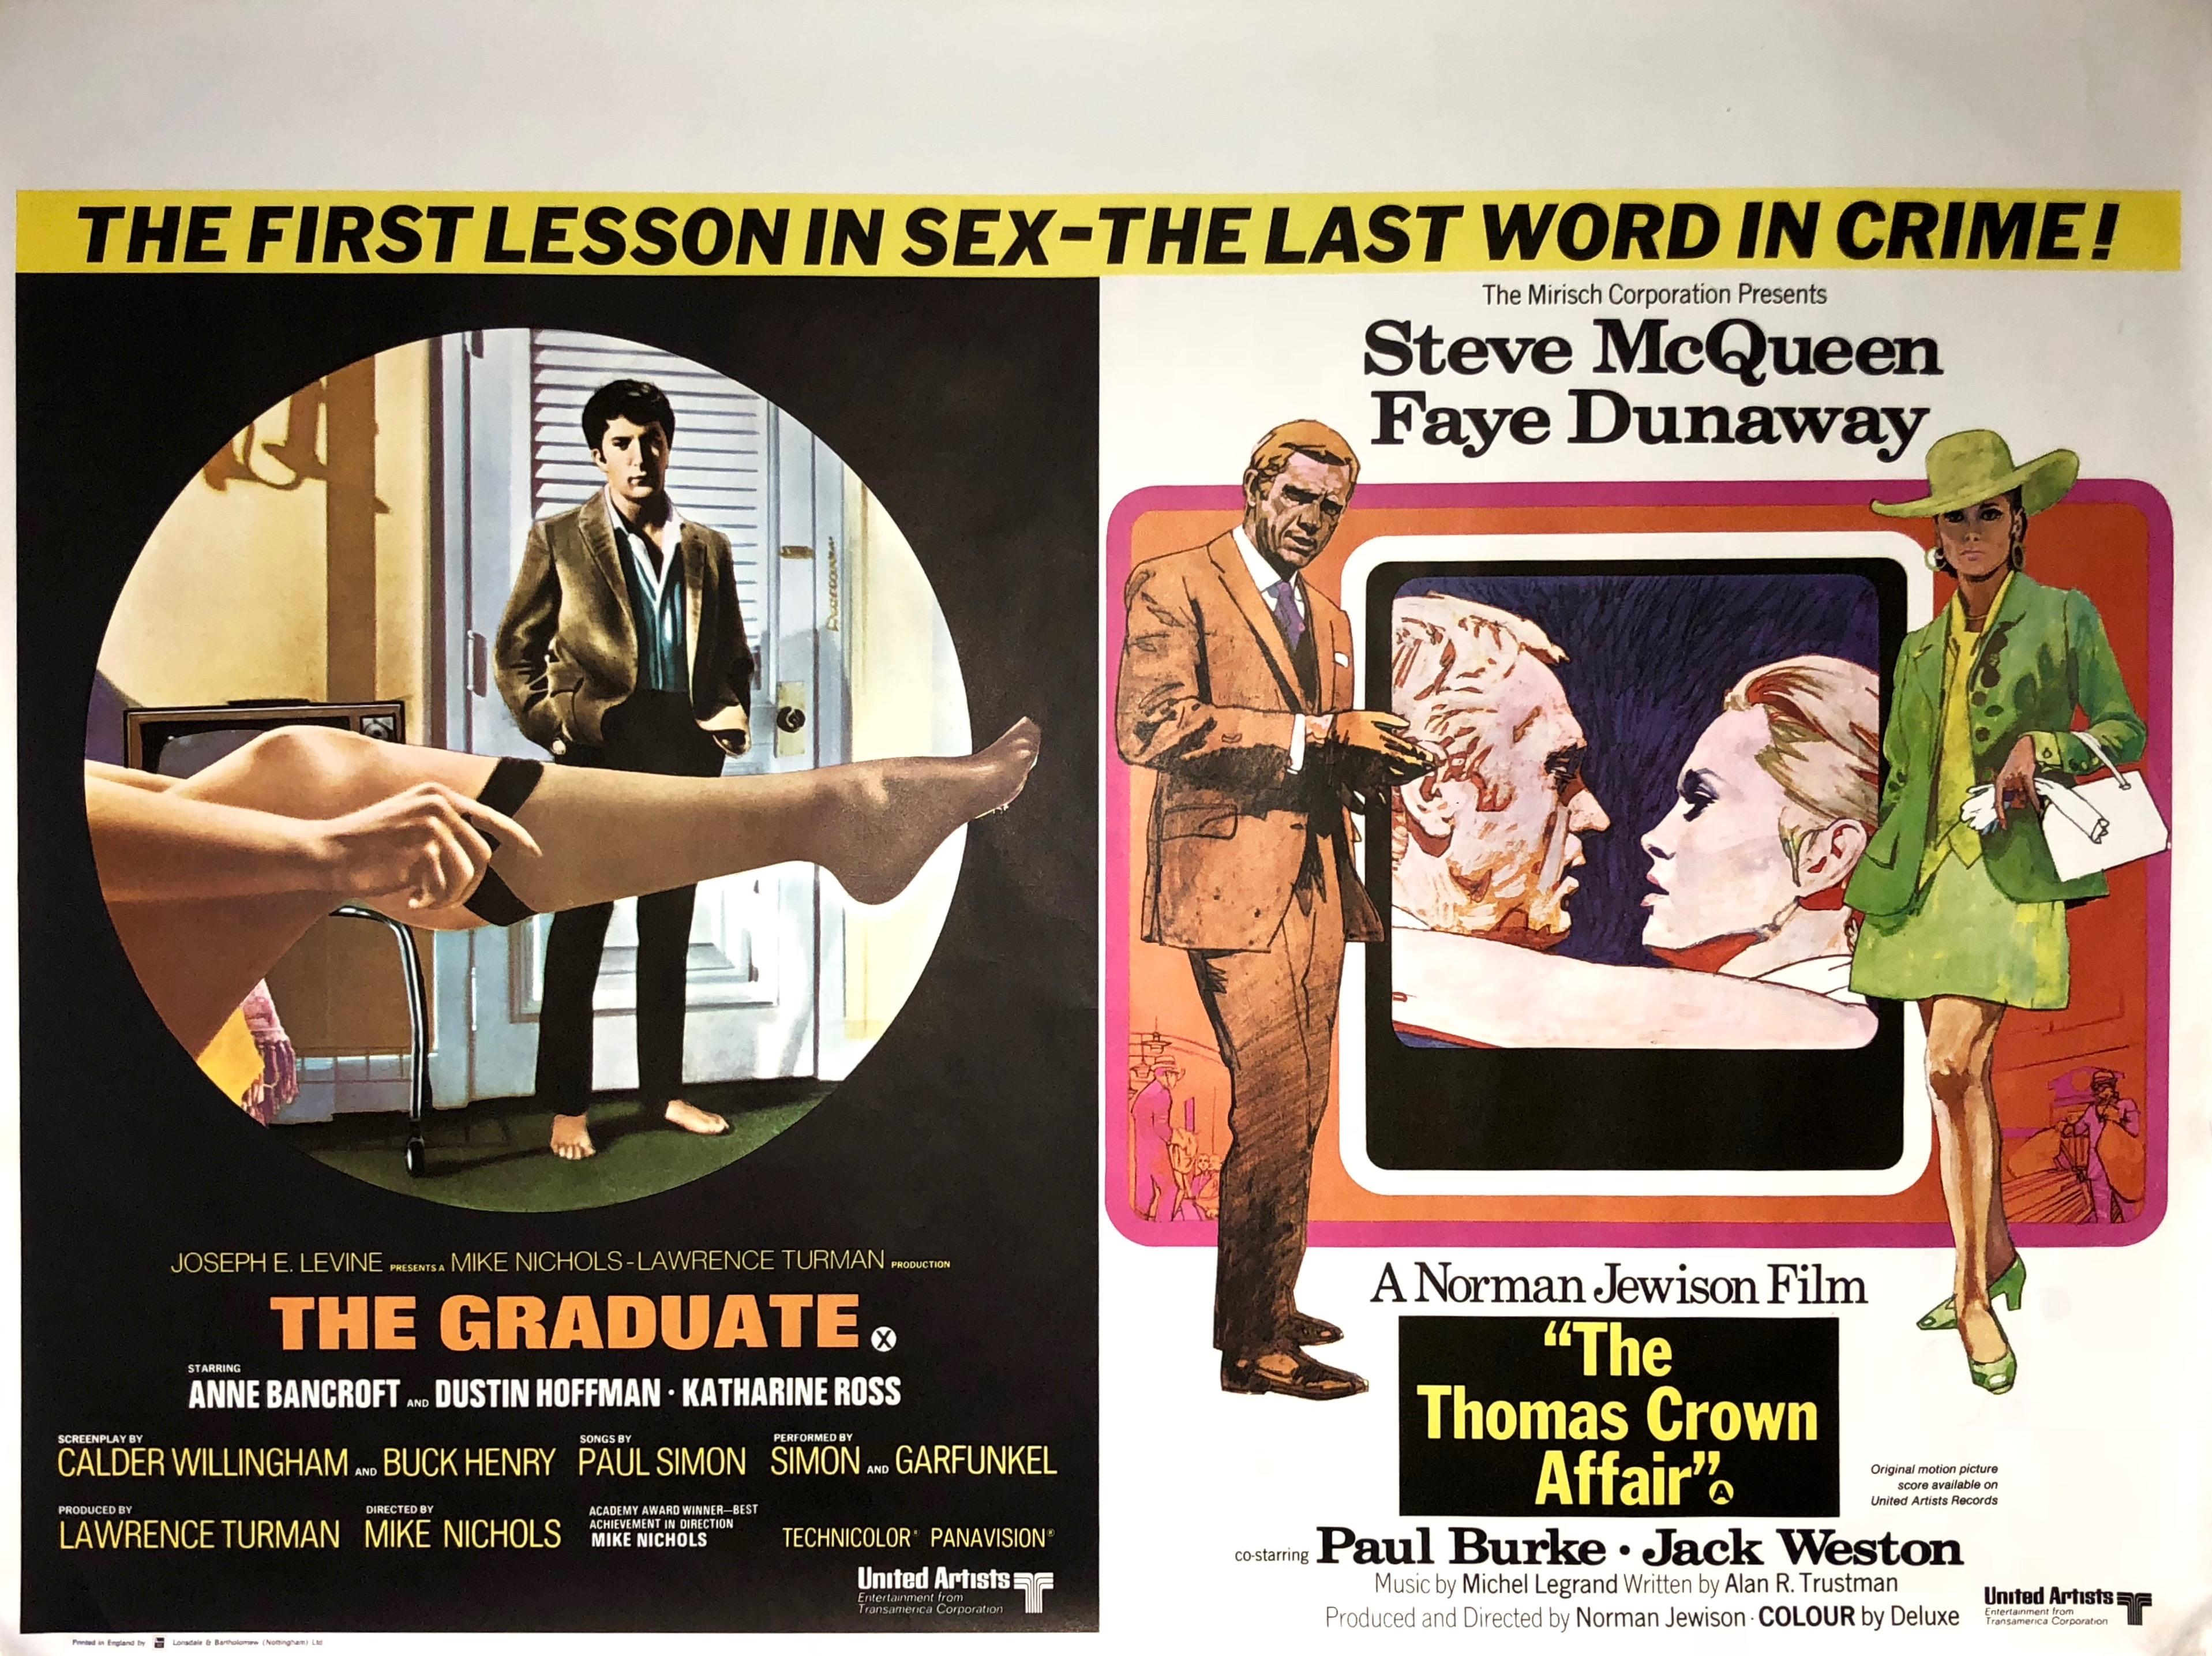 The-Graduate-/-The-Thomas-Crown-Affair-Movie-Poster